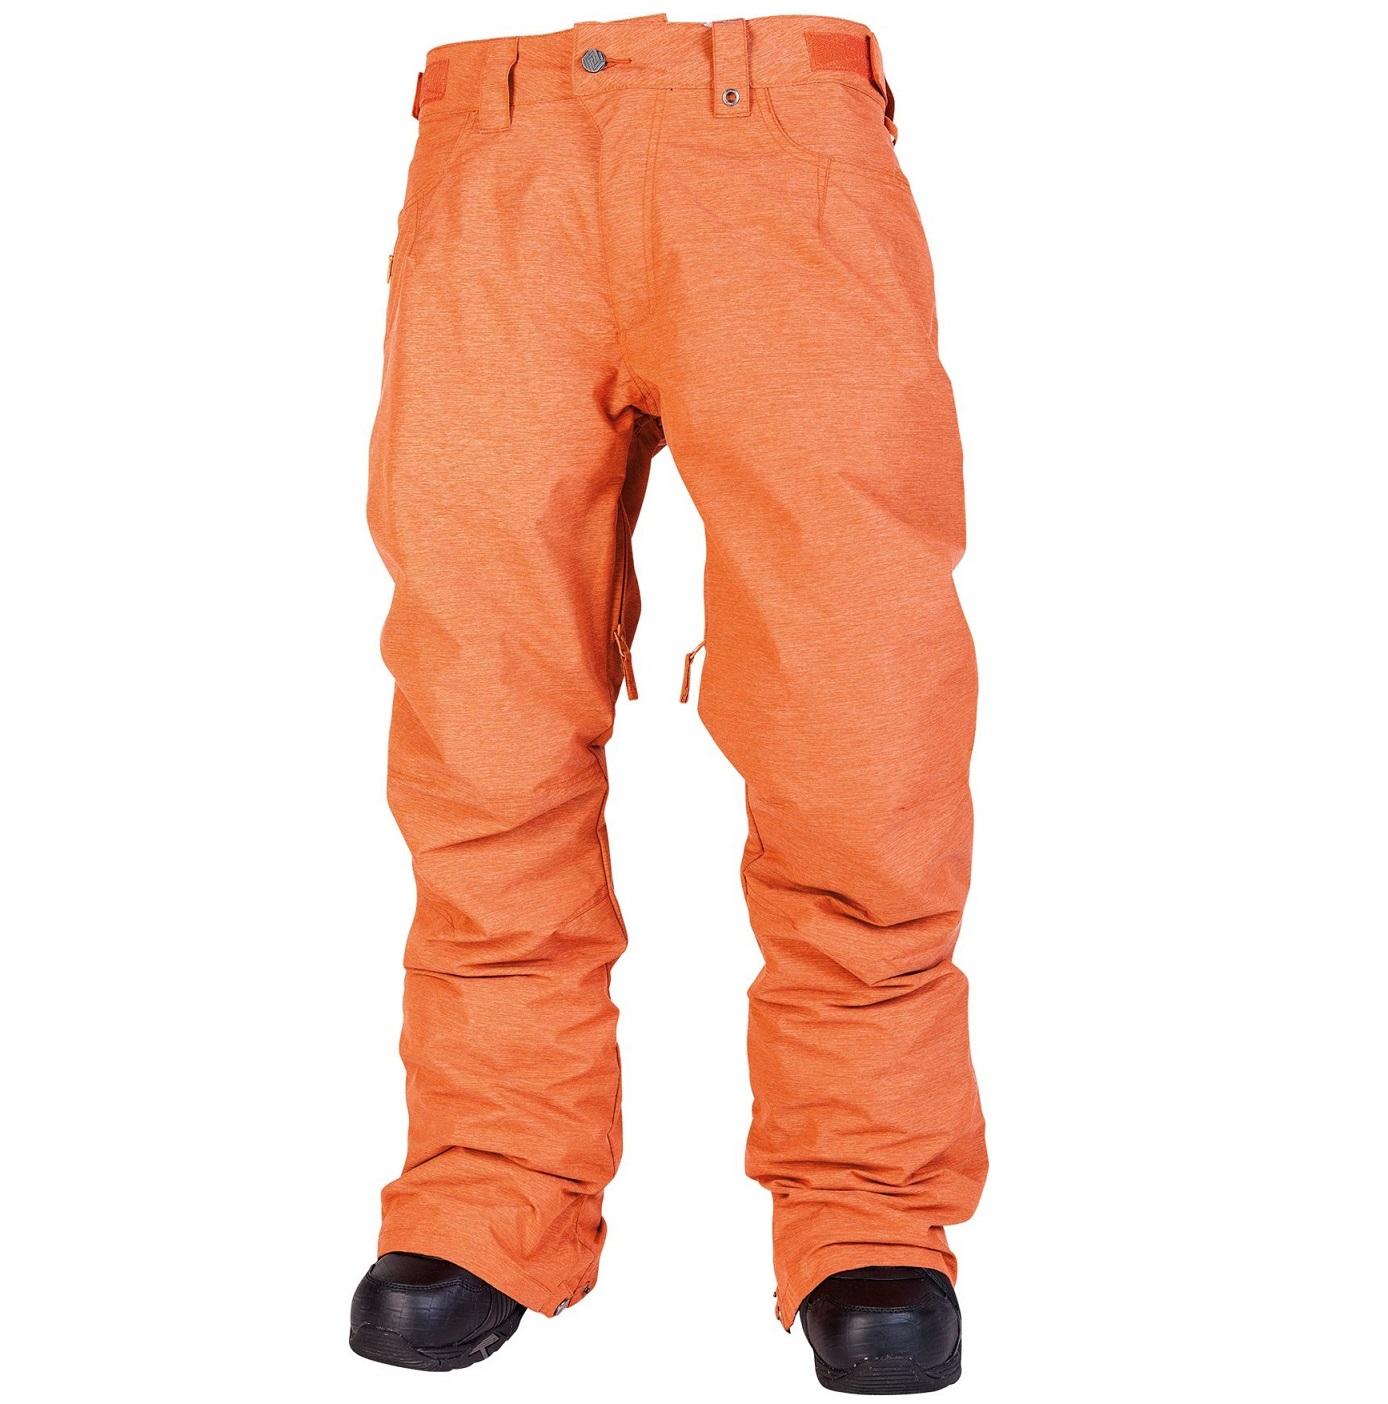 Nitro kalhoty na snowboard Slacker Orange Velikost: L